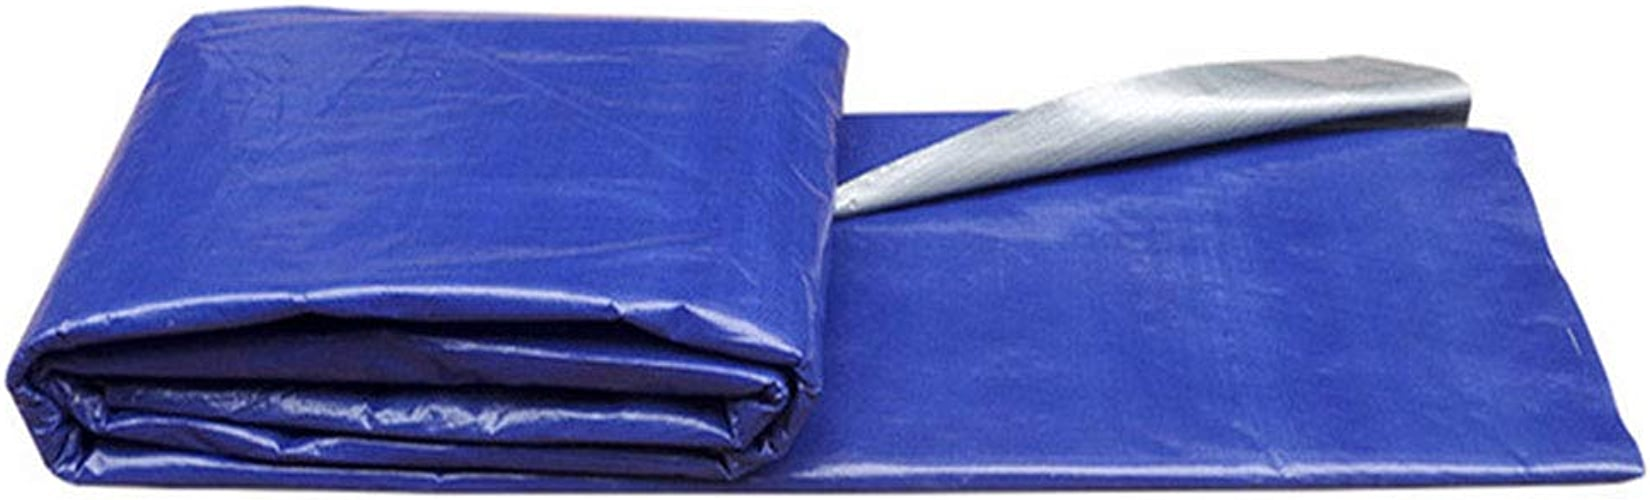 WHYDIANPU Tarpaulin Abat-Jour en Tissu Bleu argenté Tissu gris Bleu Tissu imperméable Tissu imperméable en Plastique Bleu imperméable Various Tailles